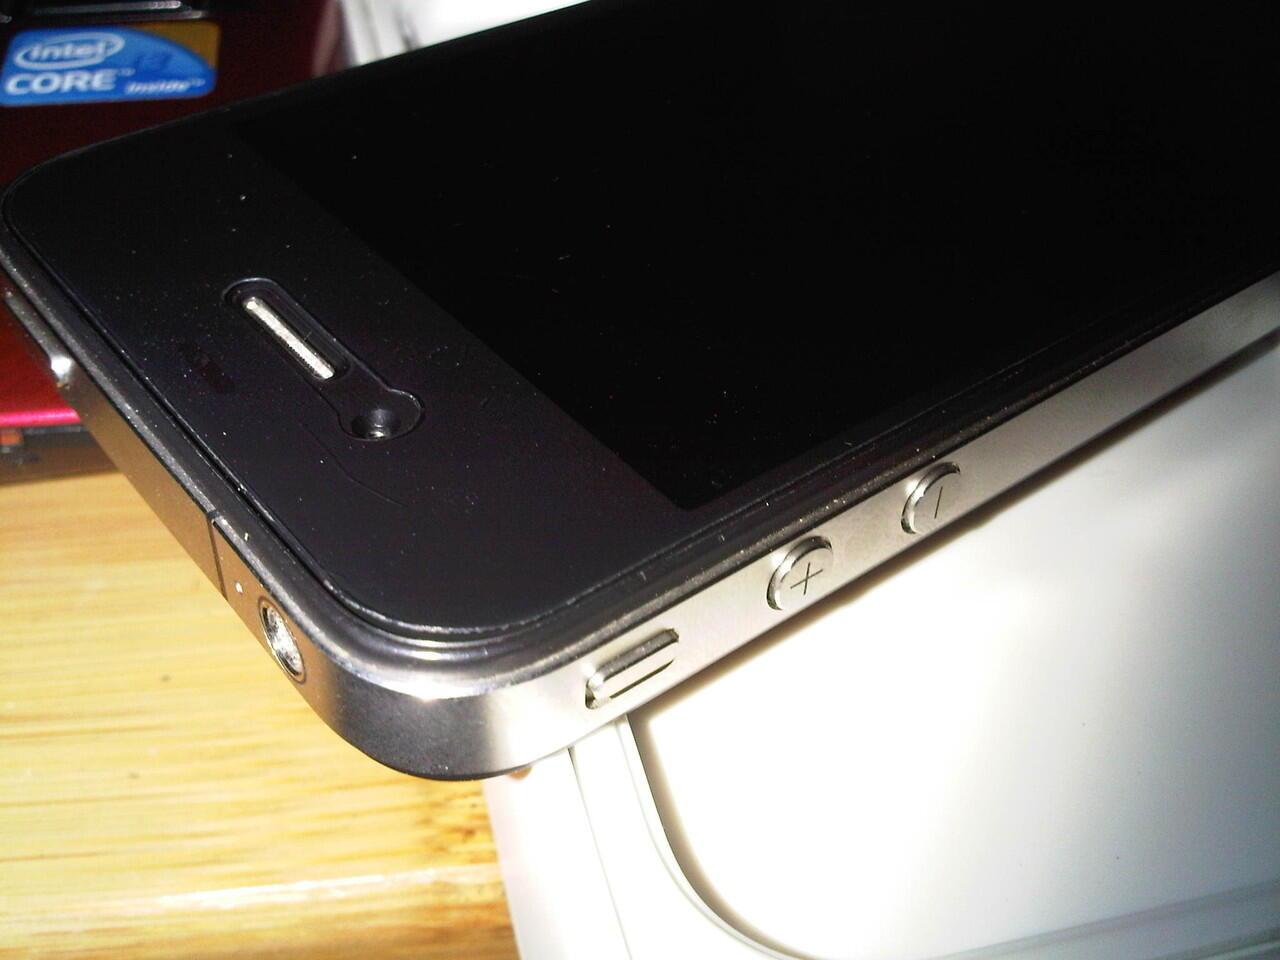 iphone 4 FU 16gb